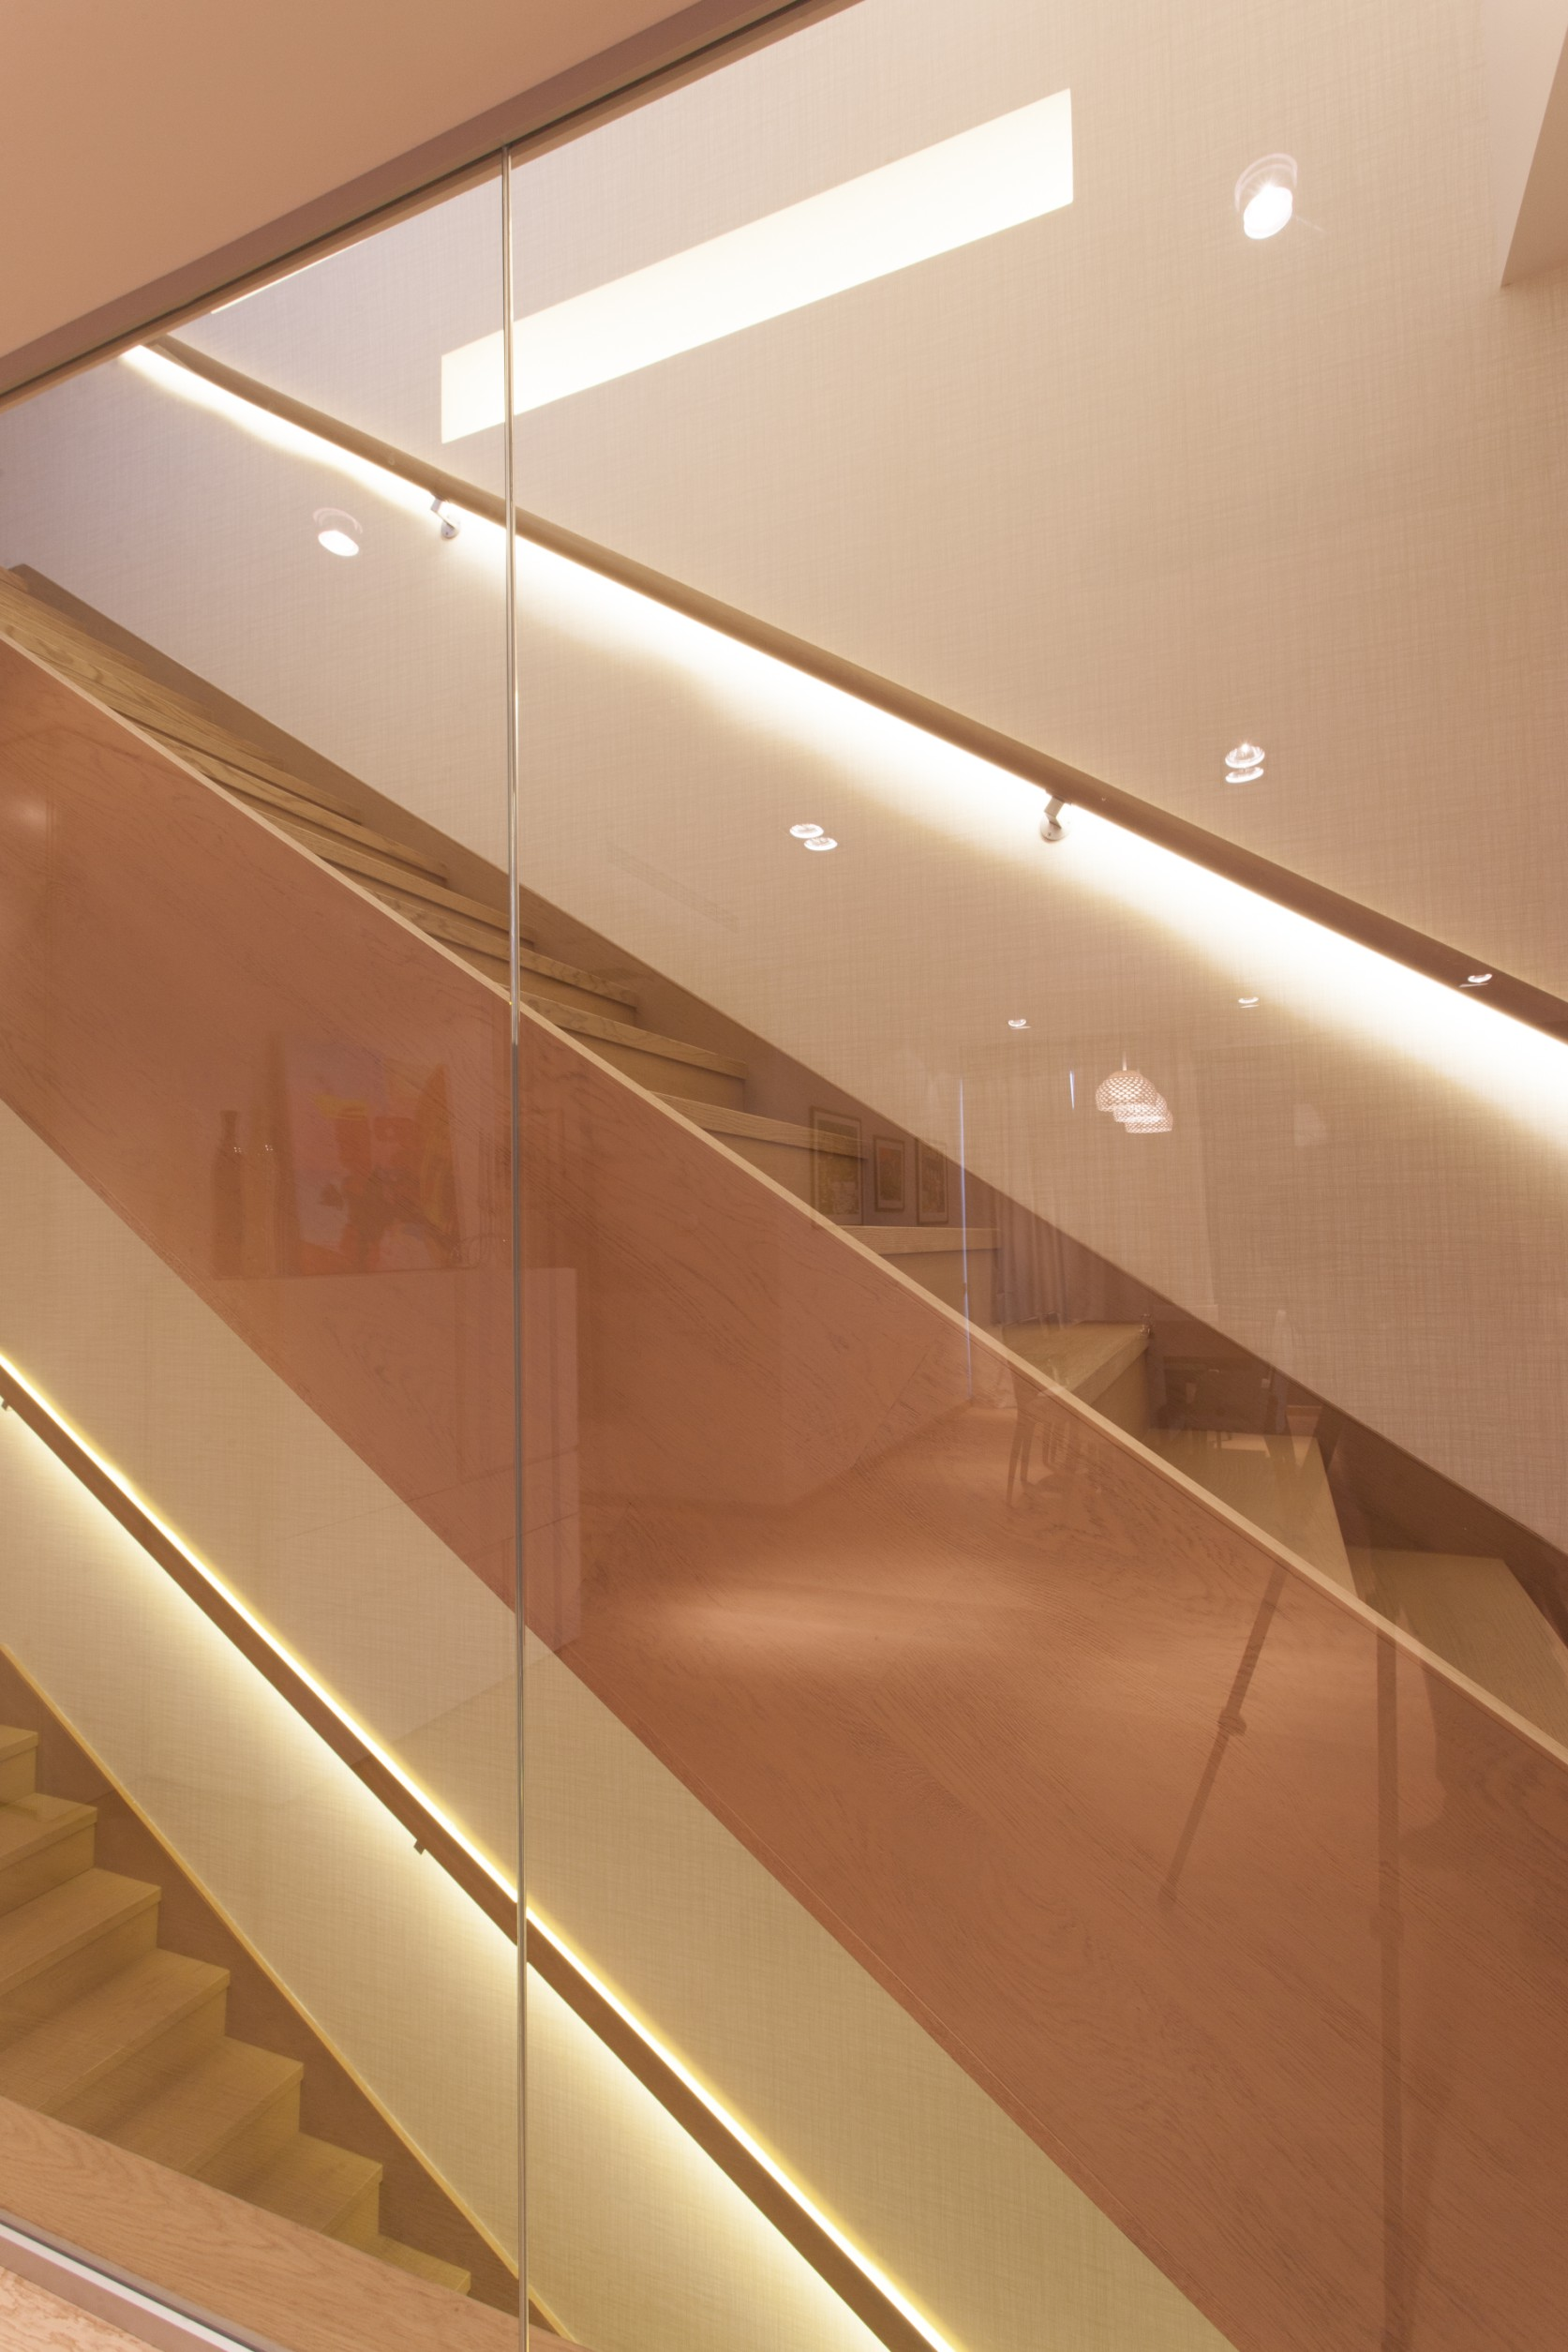 https://nbc-arhitect.ro/wp-content/uploads/2020/10/NBC-Arhitect-_-Petofi-Sandor-_-Housing-_-interior-design_stairs_6.jpg